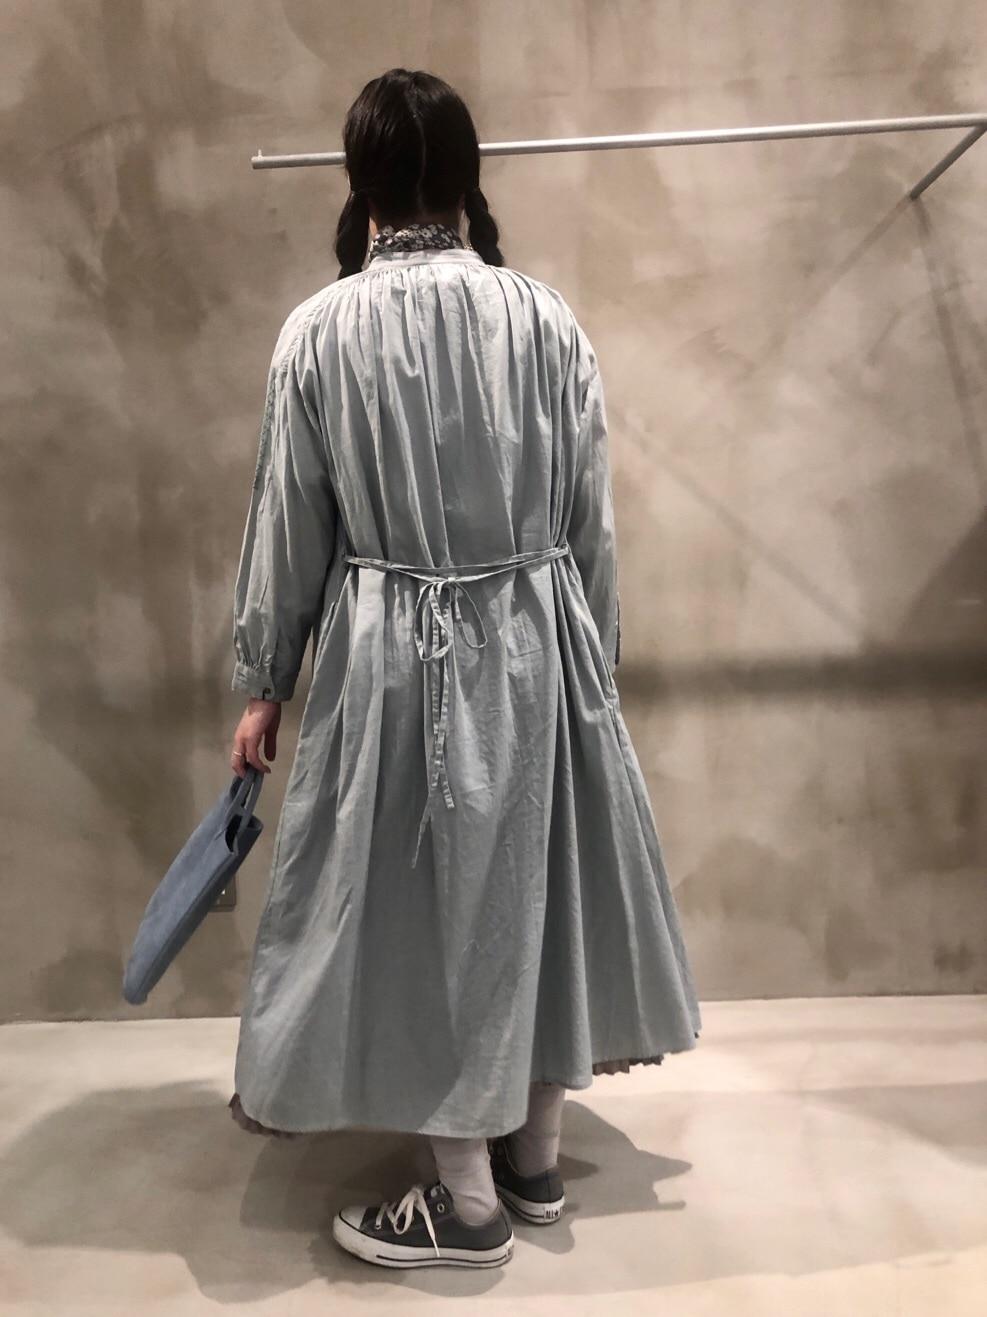 bulle de savon 渋谷スクランブルスクエア 身長:157cm 2020.03.13